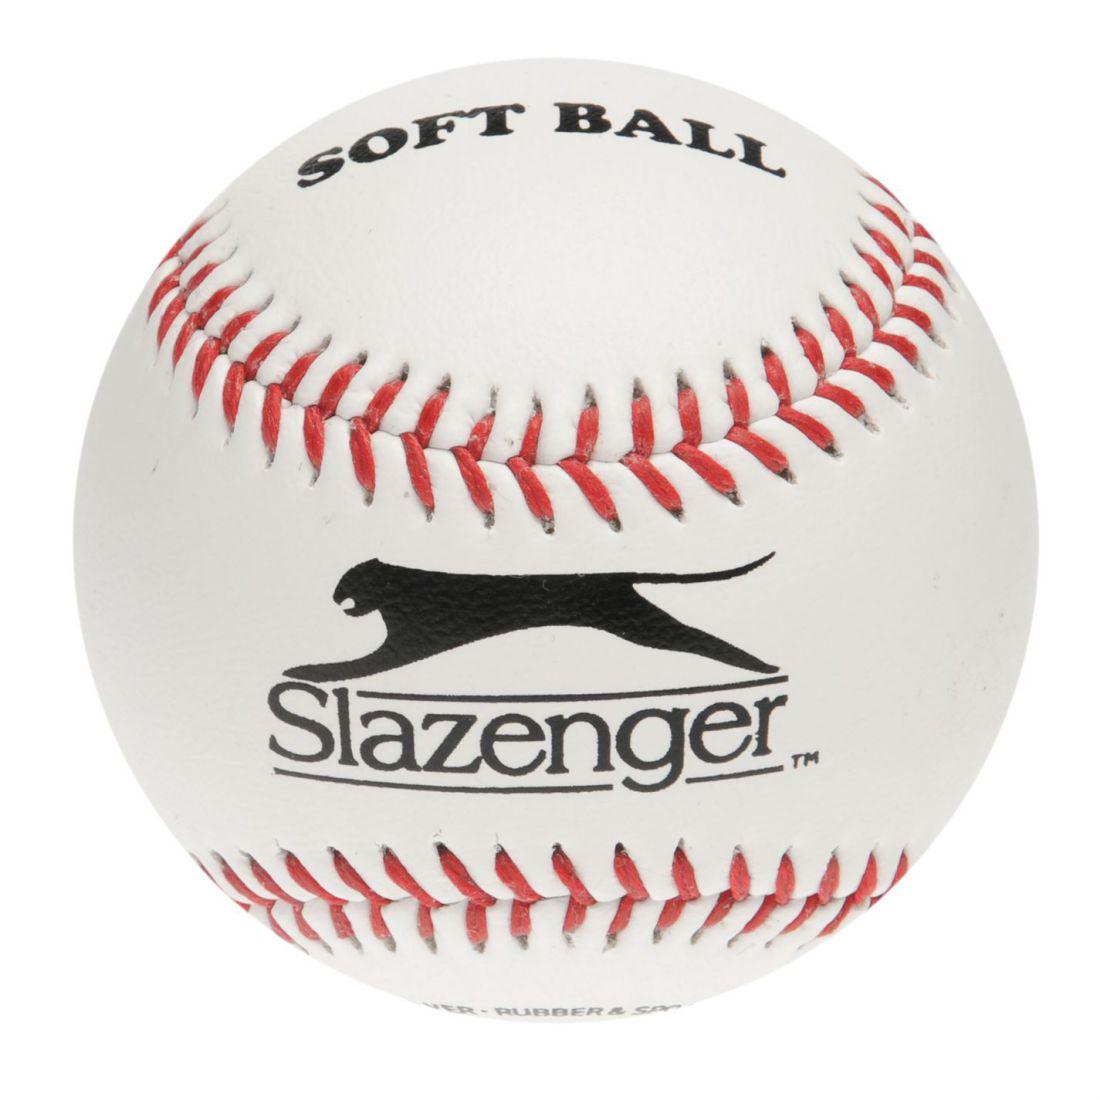 Slazenger Unisex Softcore Baseball Softball